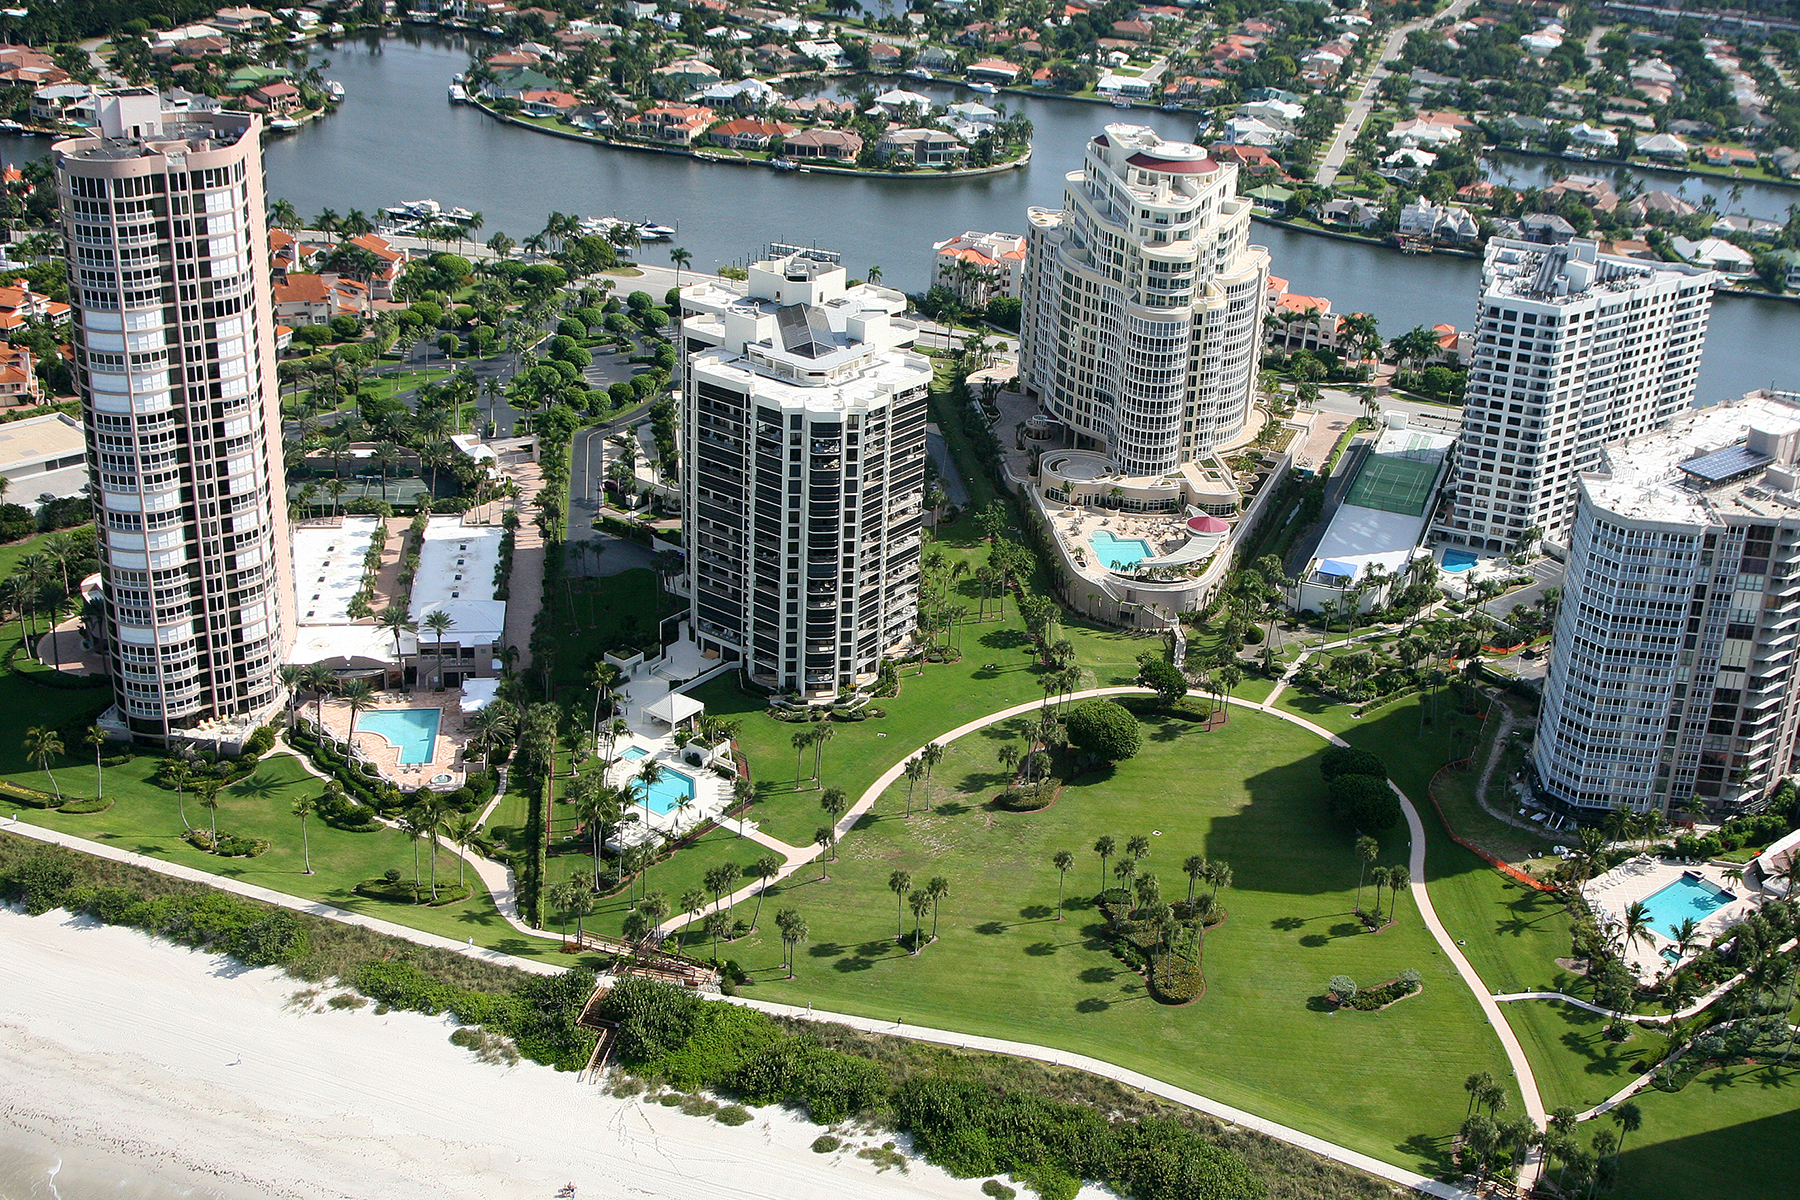 Condominium for Sale at PARK SHORE - MONACO BEACH CLUB 4401 Gulf Shore Blvd N 505 Naples, Florida 34103 United States